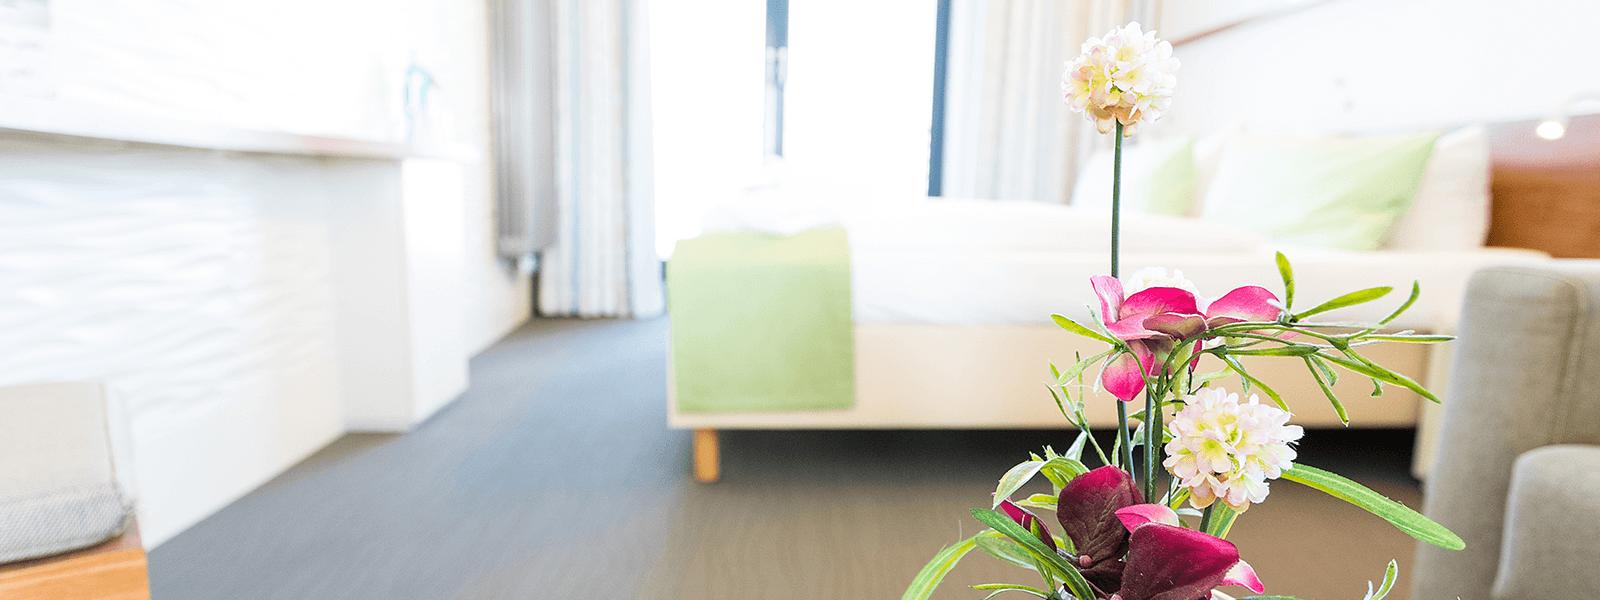 Blick ins Hotelzimmer mit Doppelbett